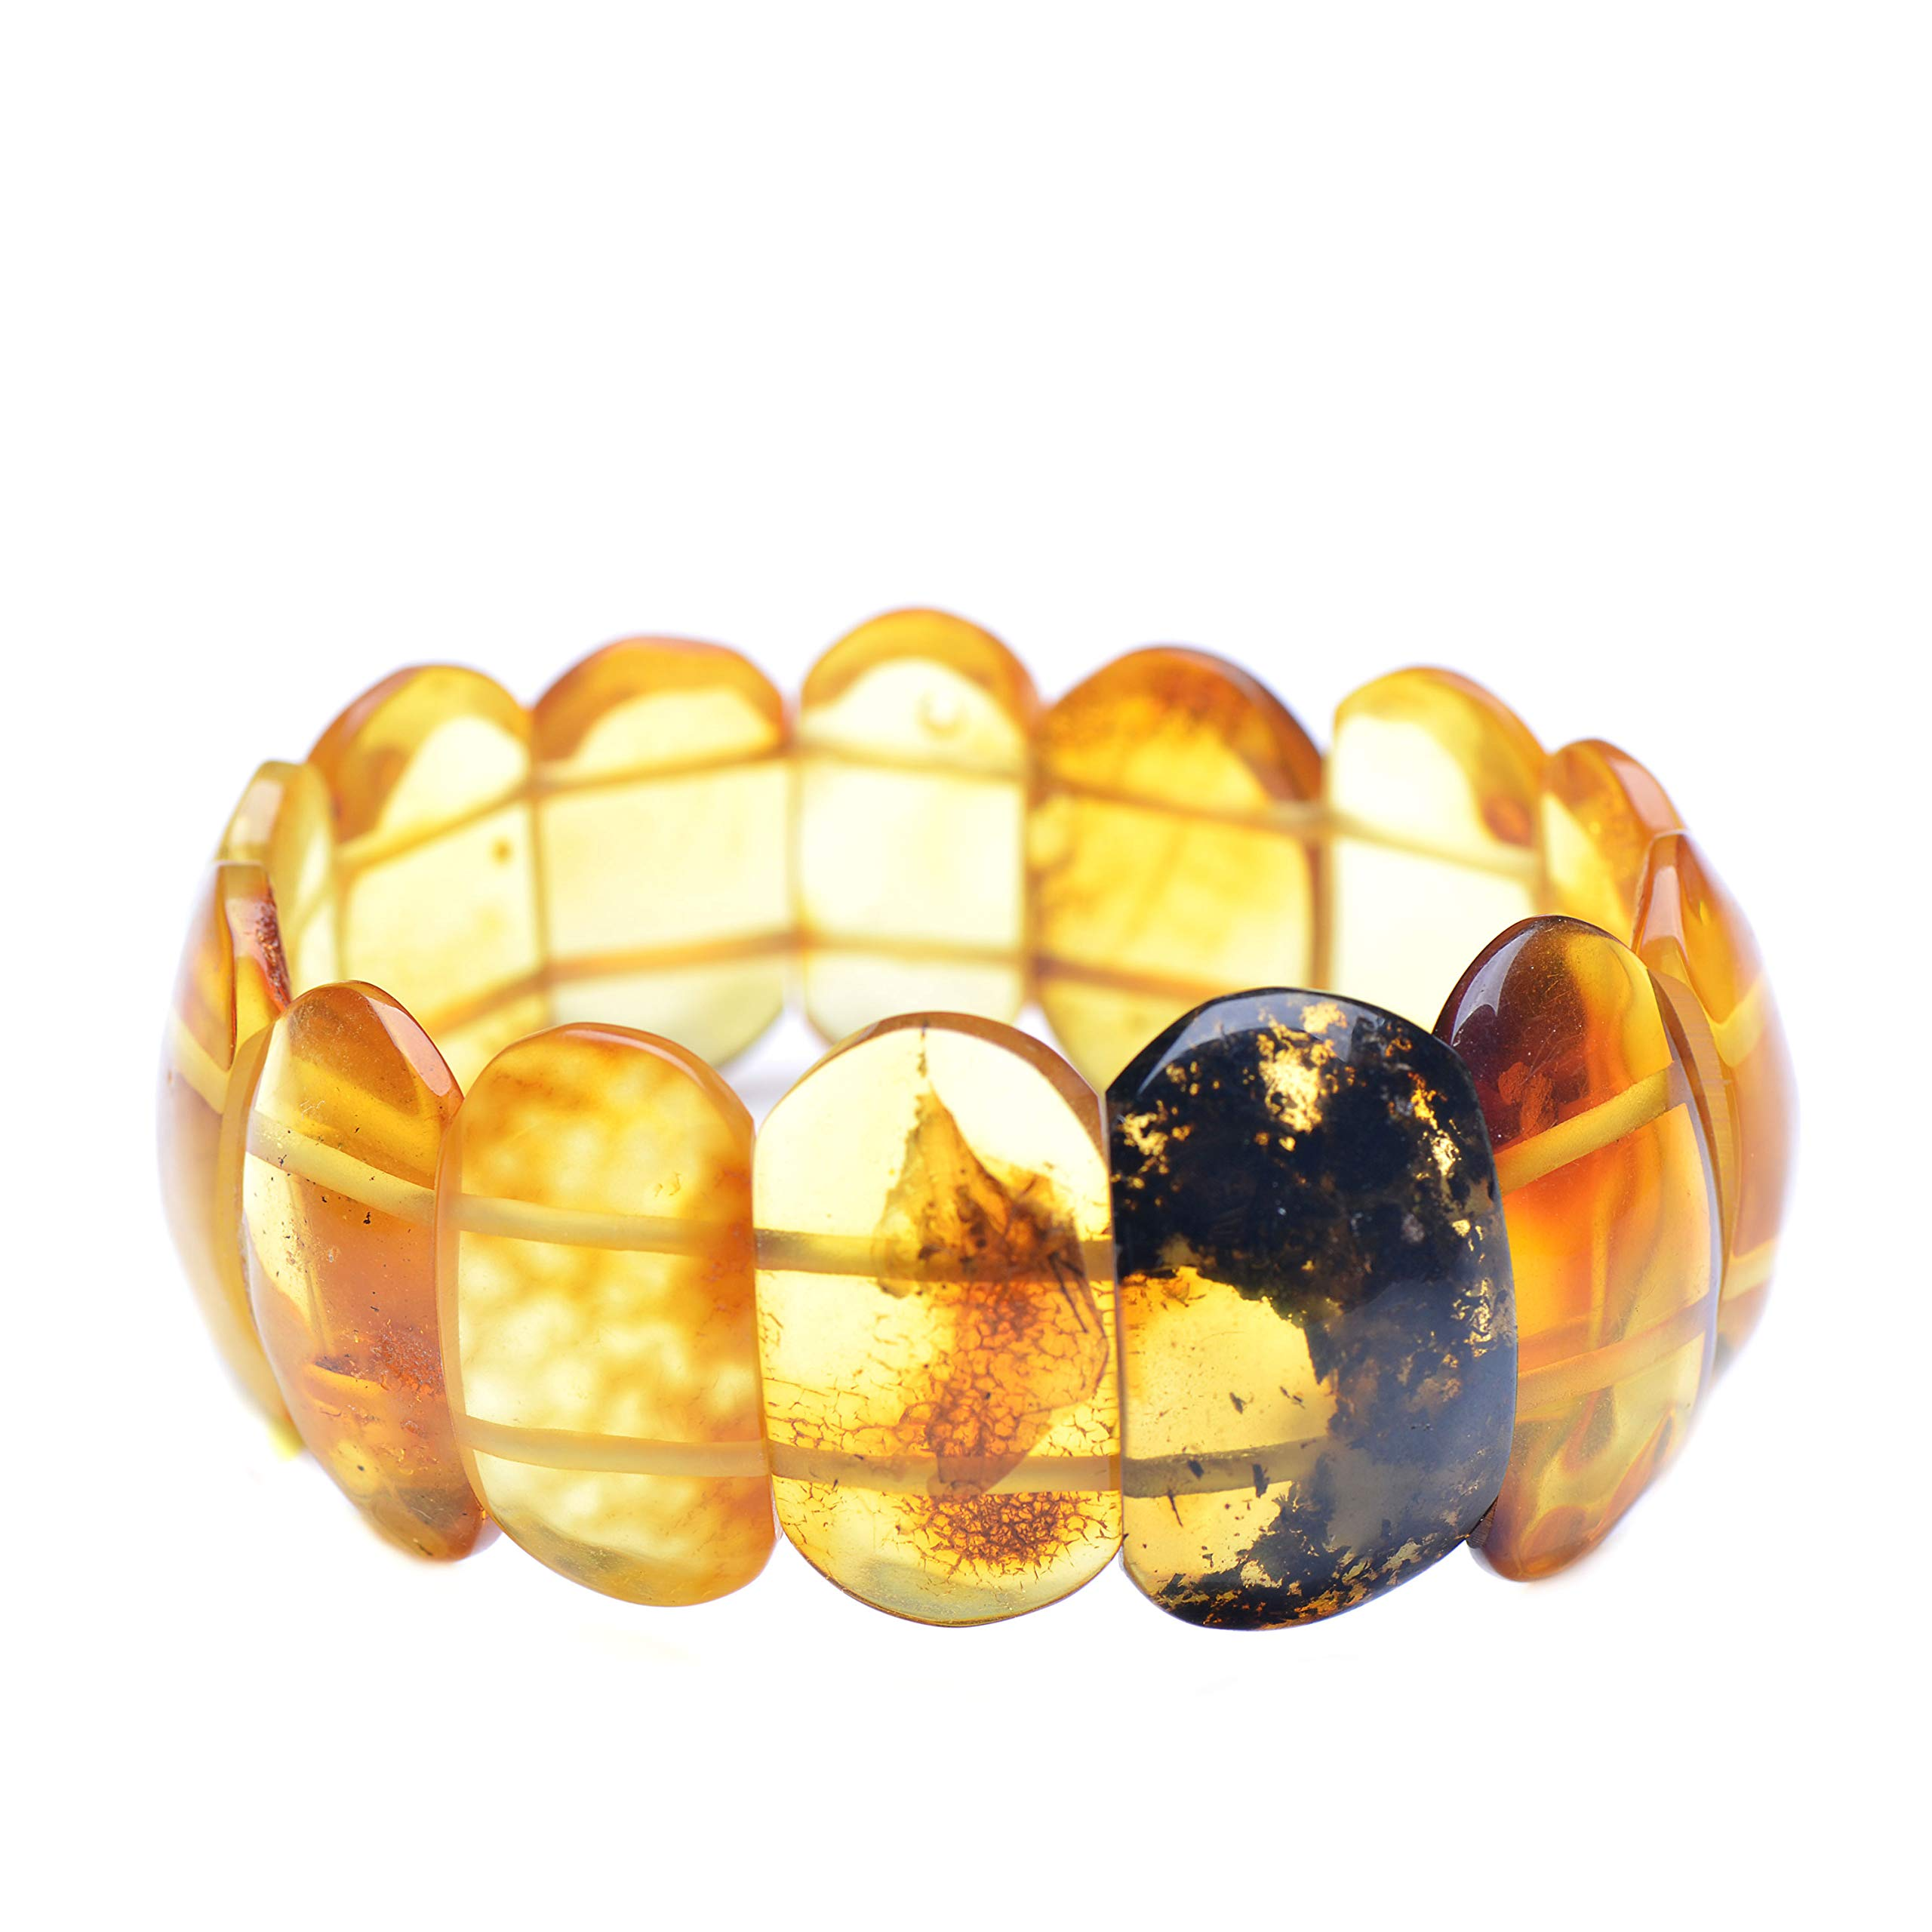 Amber Bracelet - Bright Amber Bracelet - Exclusive Amber Bracelet - Unique Bracelet - Unique Amber Bracelet - Genuine Baltic Amber by Genuine Amber